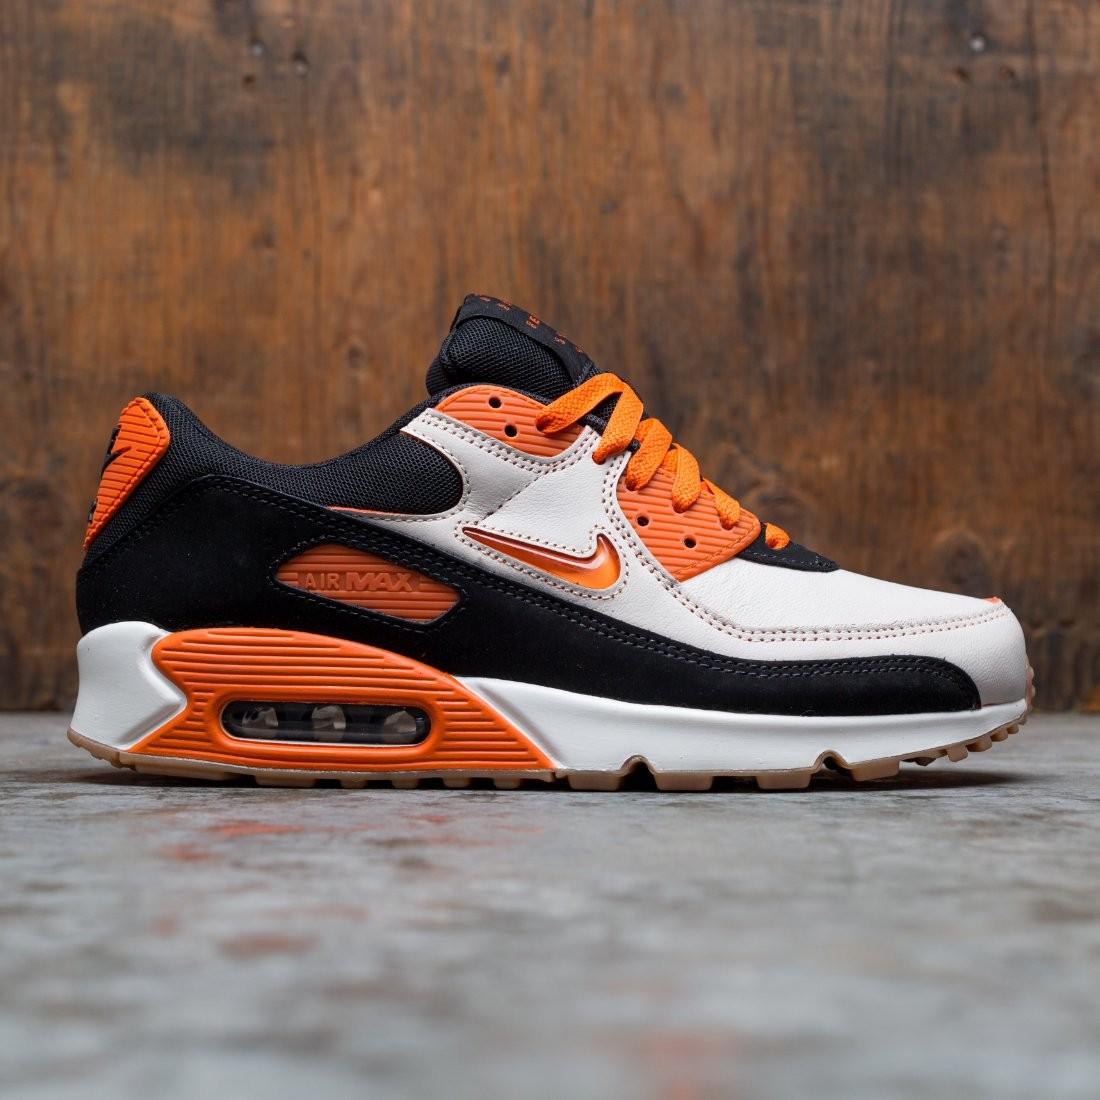 air max 90 orange noir